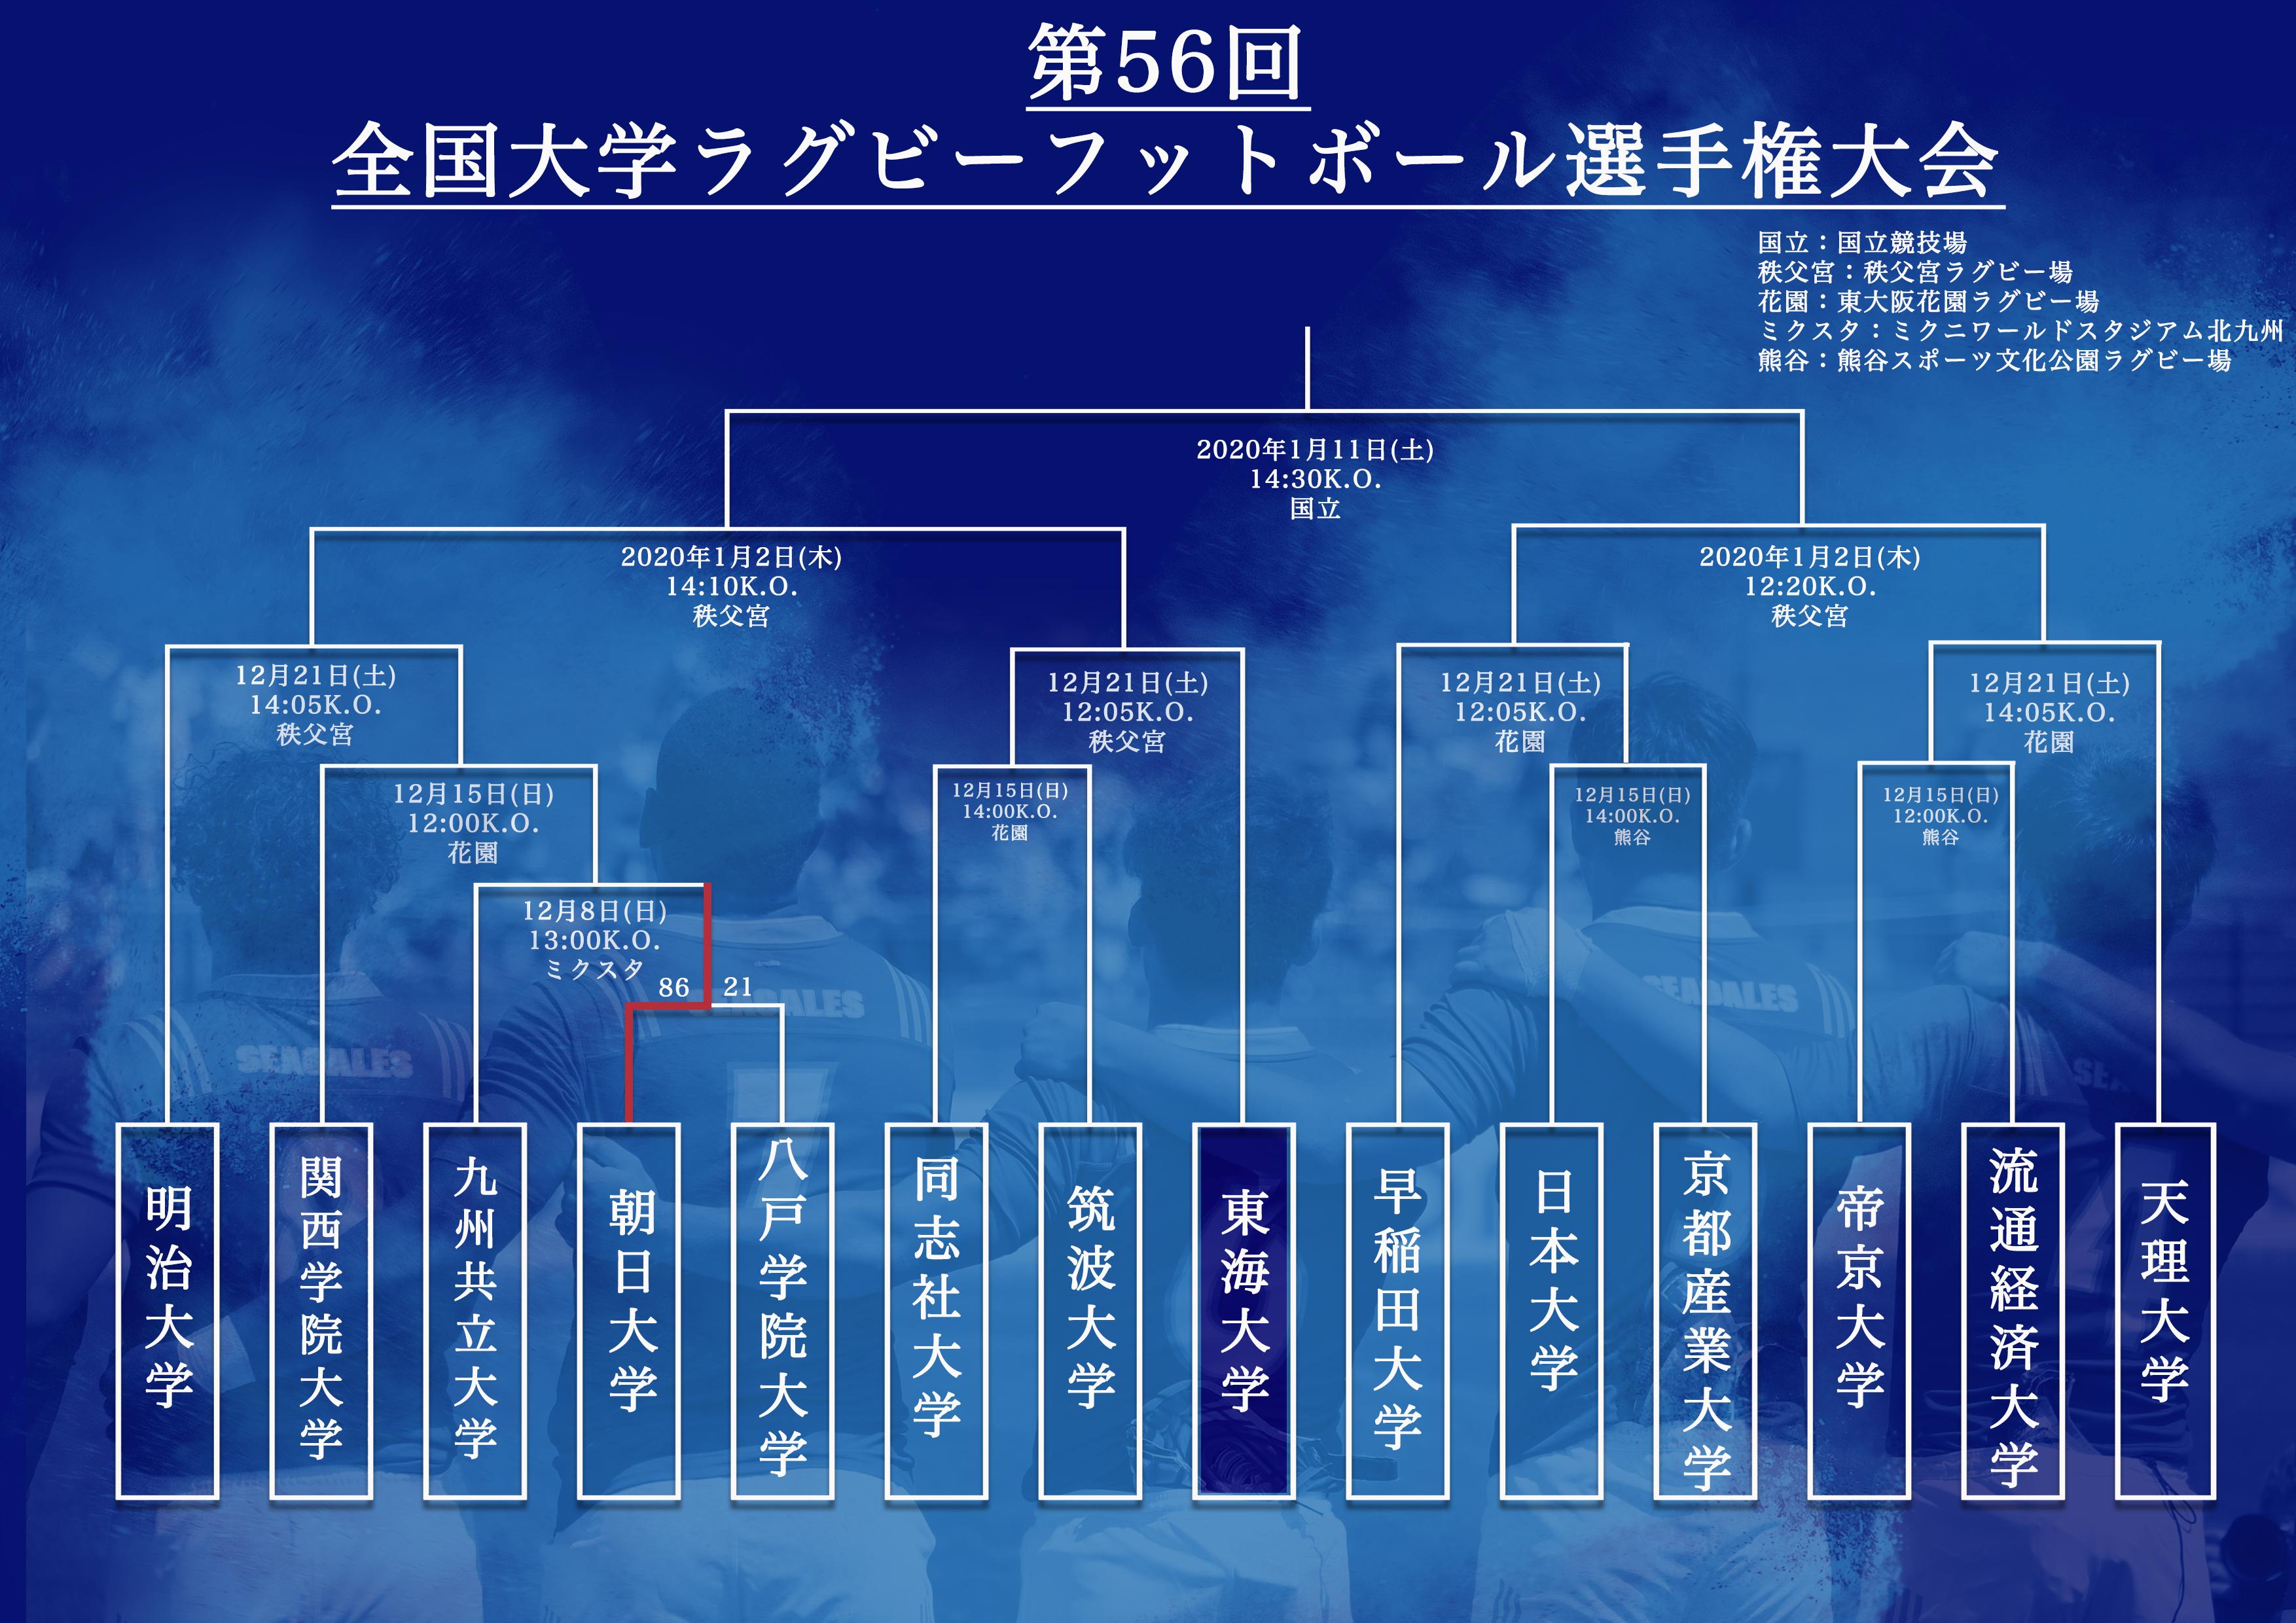 PV 試合情報2 .png